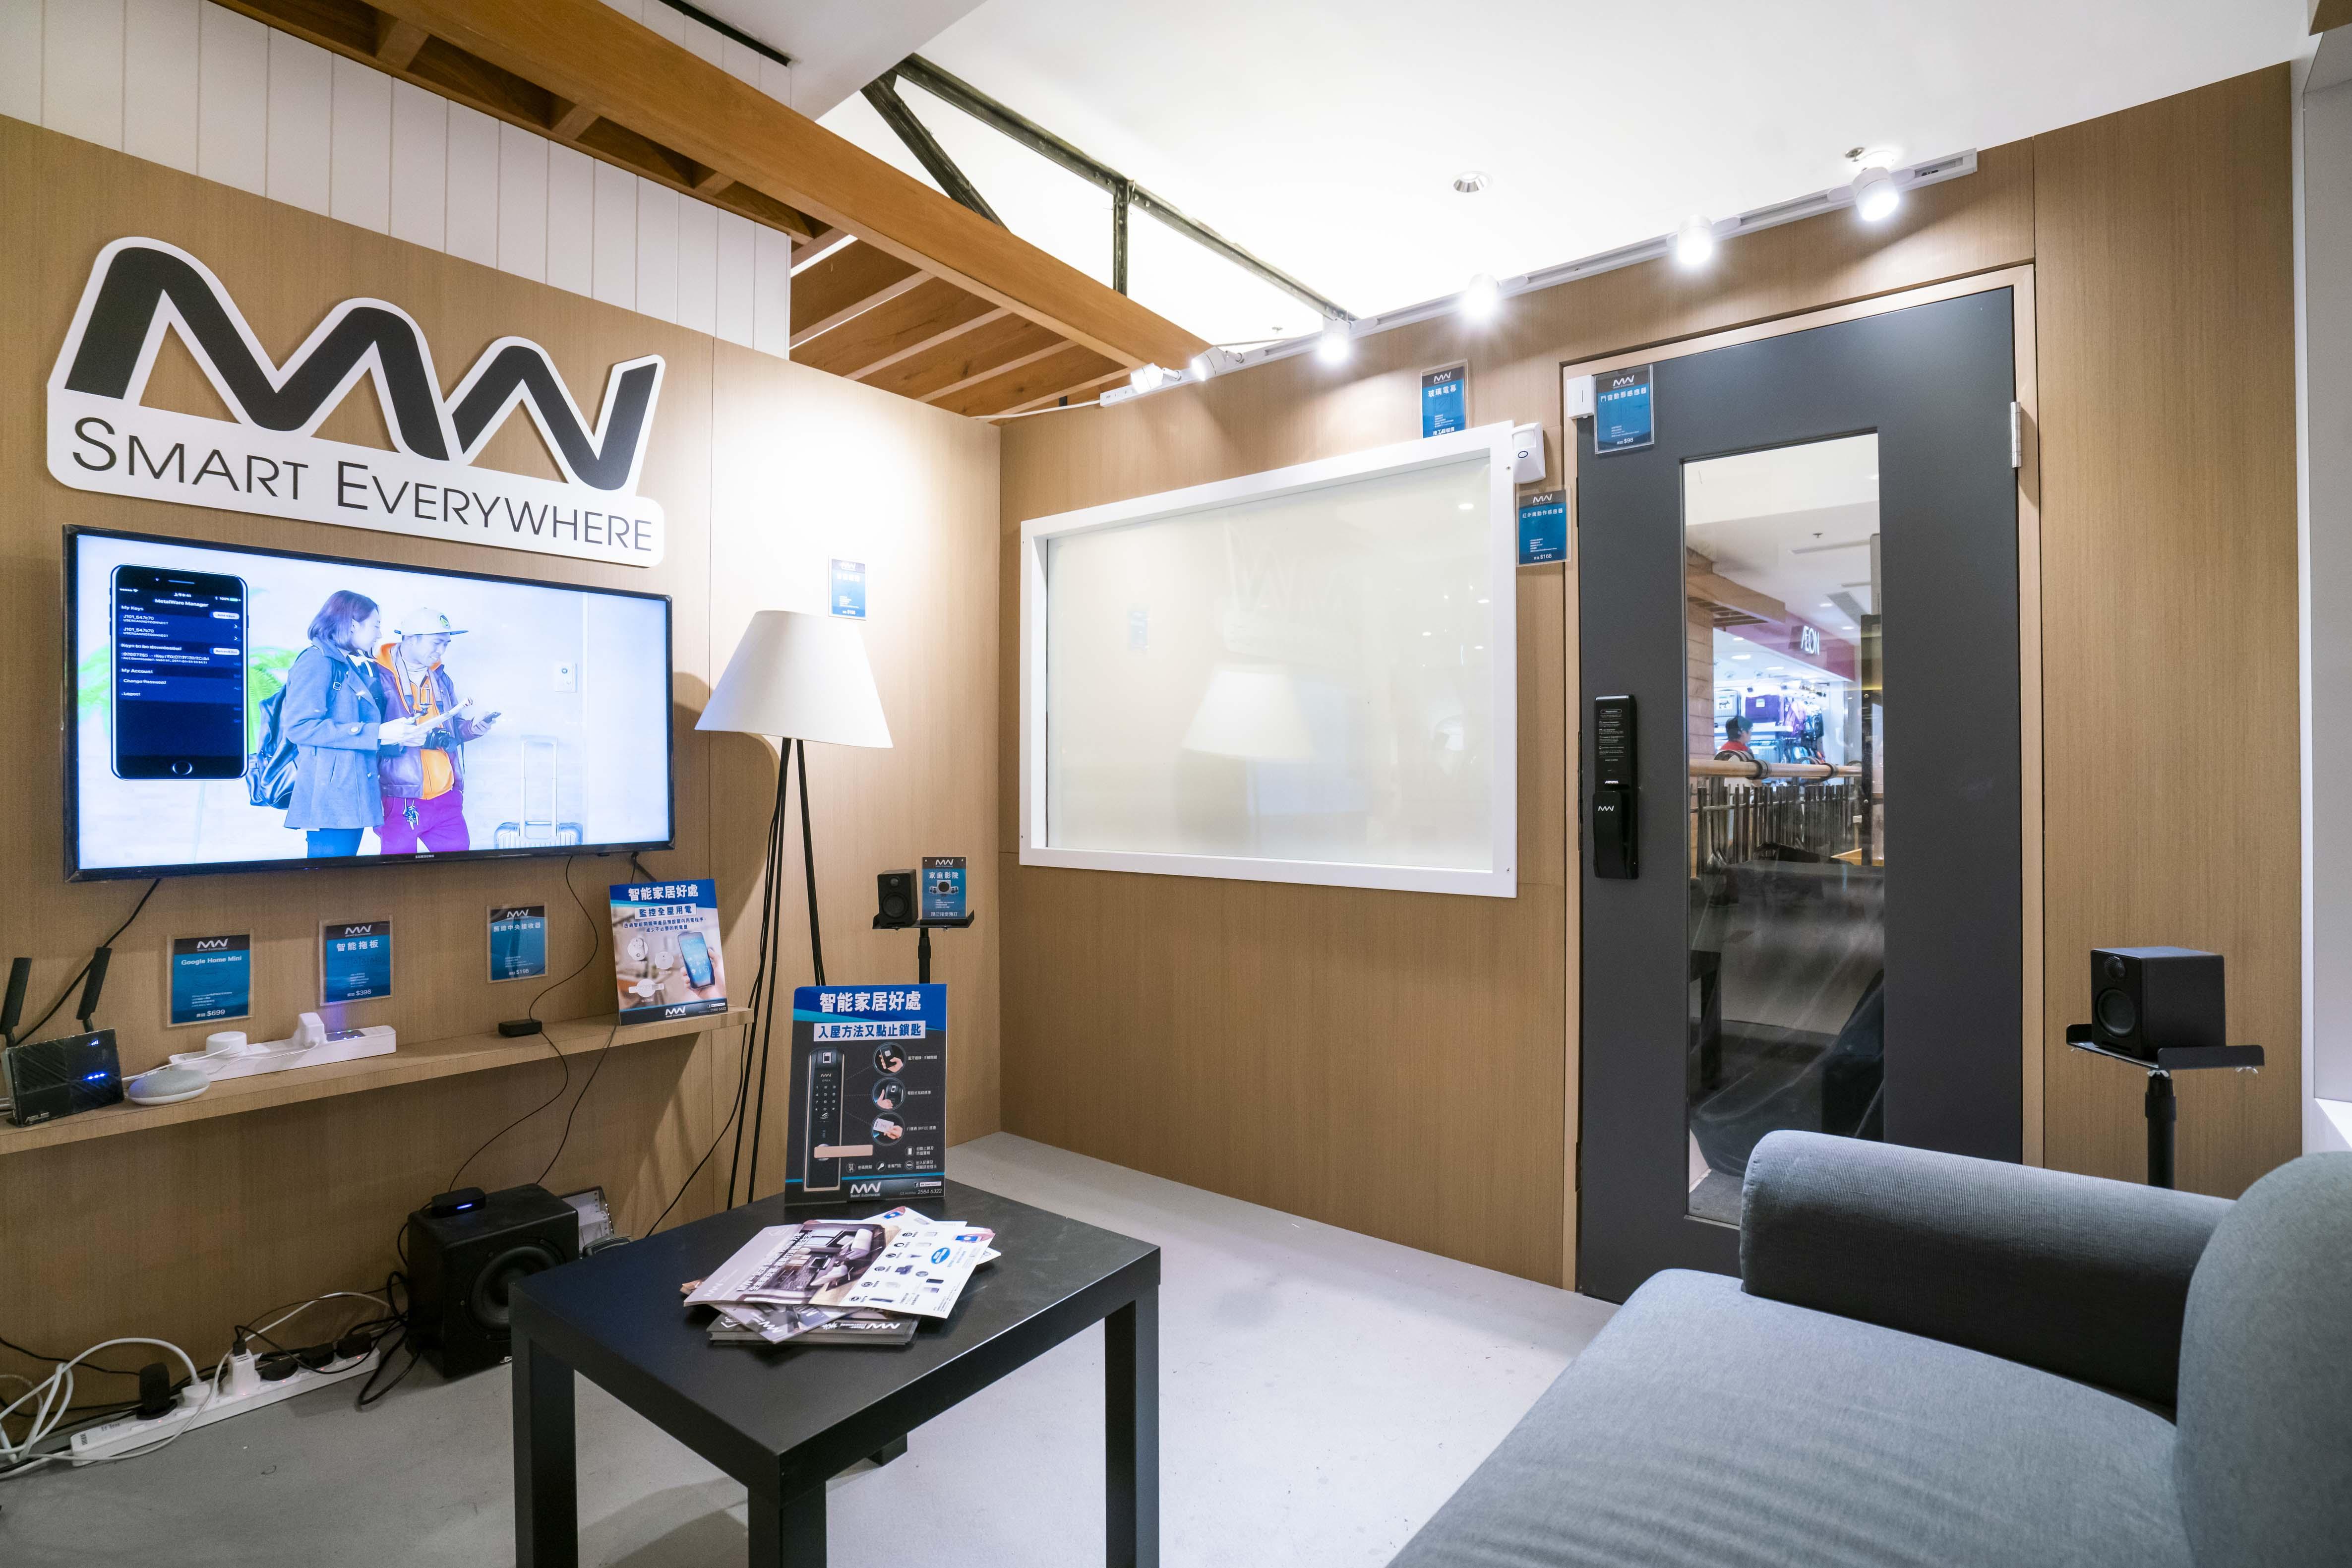 MW 智能家居展覽場地